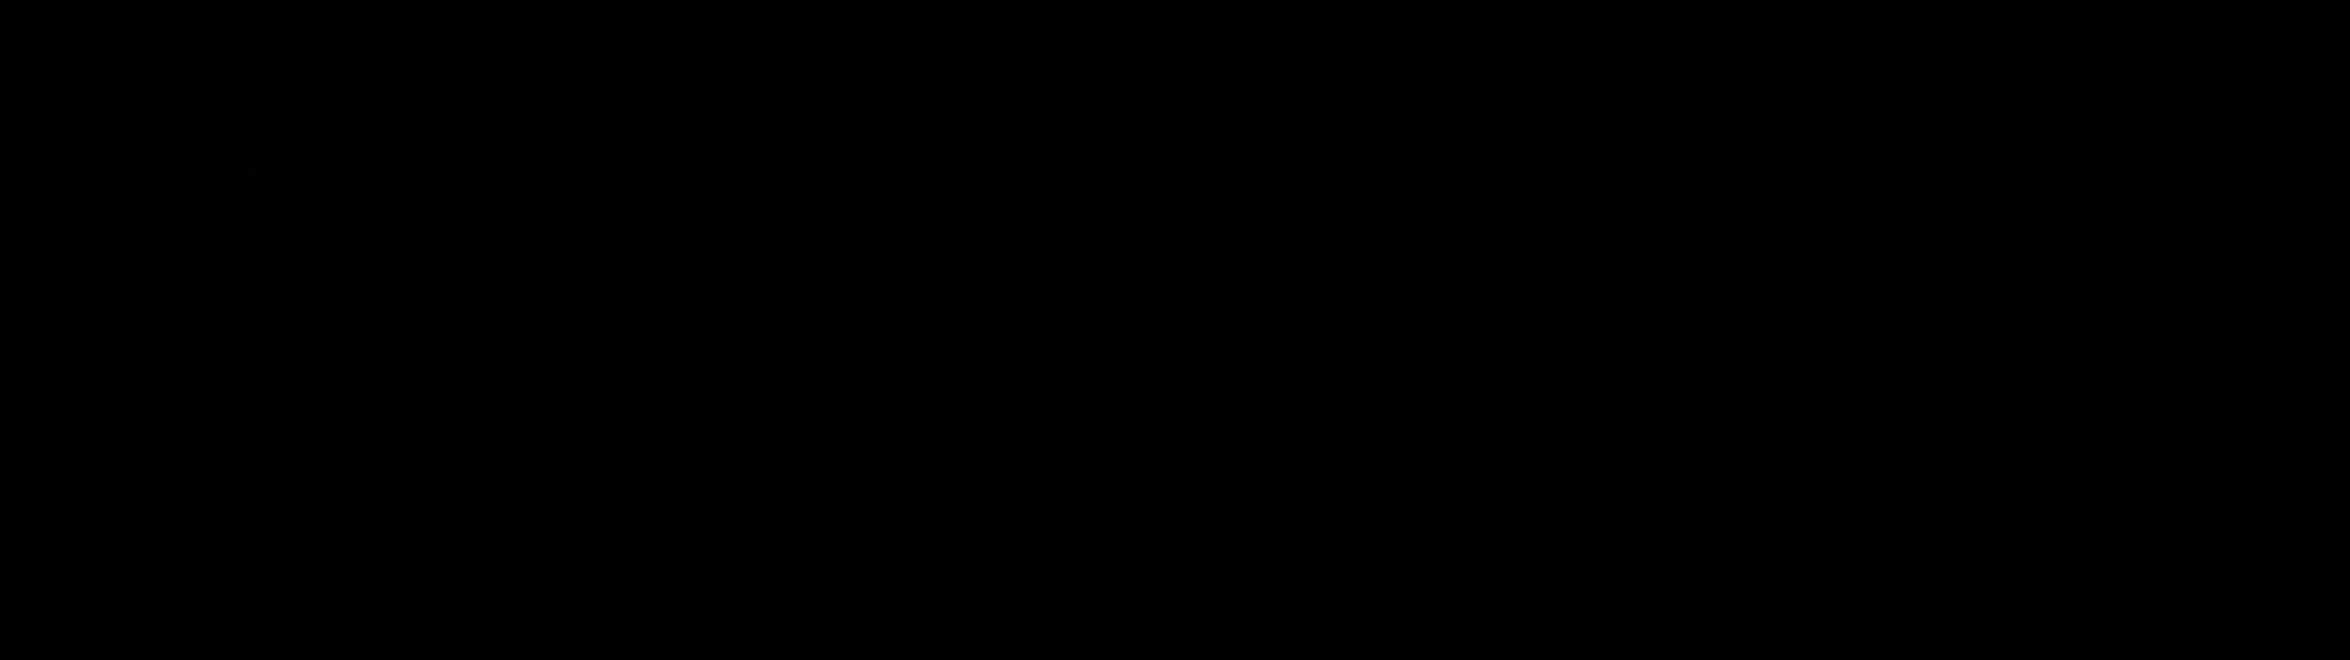 Paleta Flor